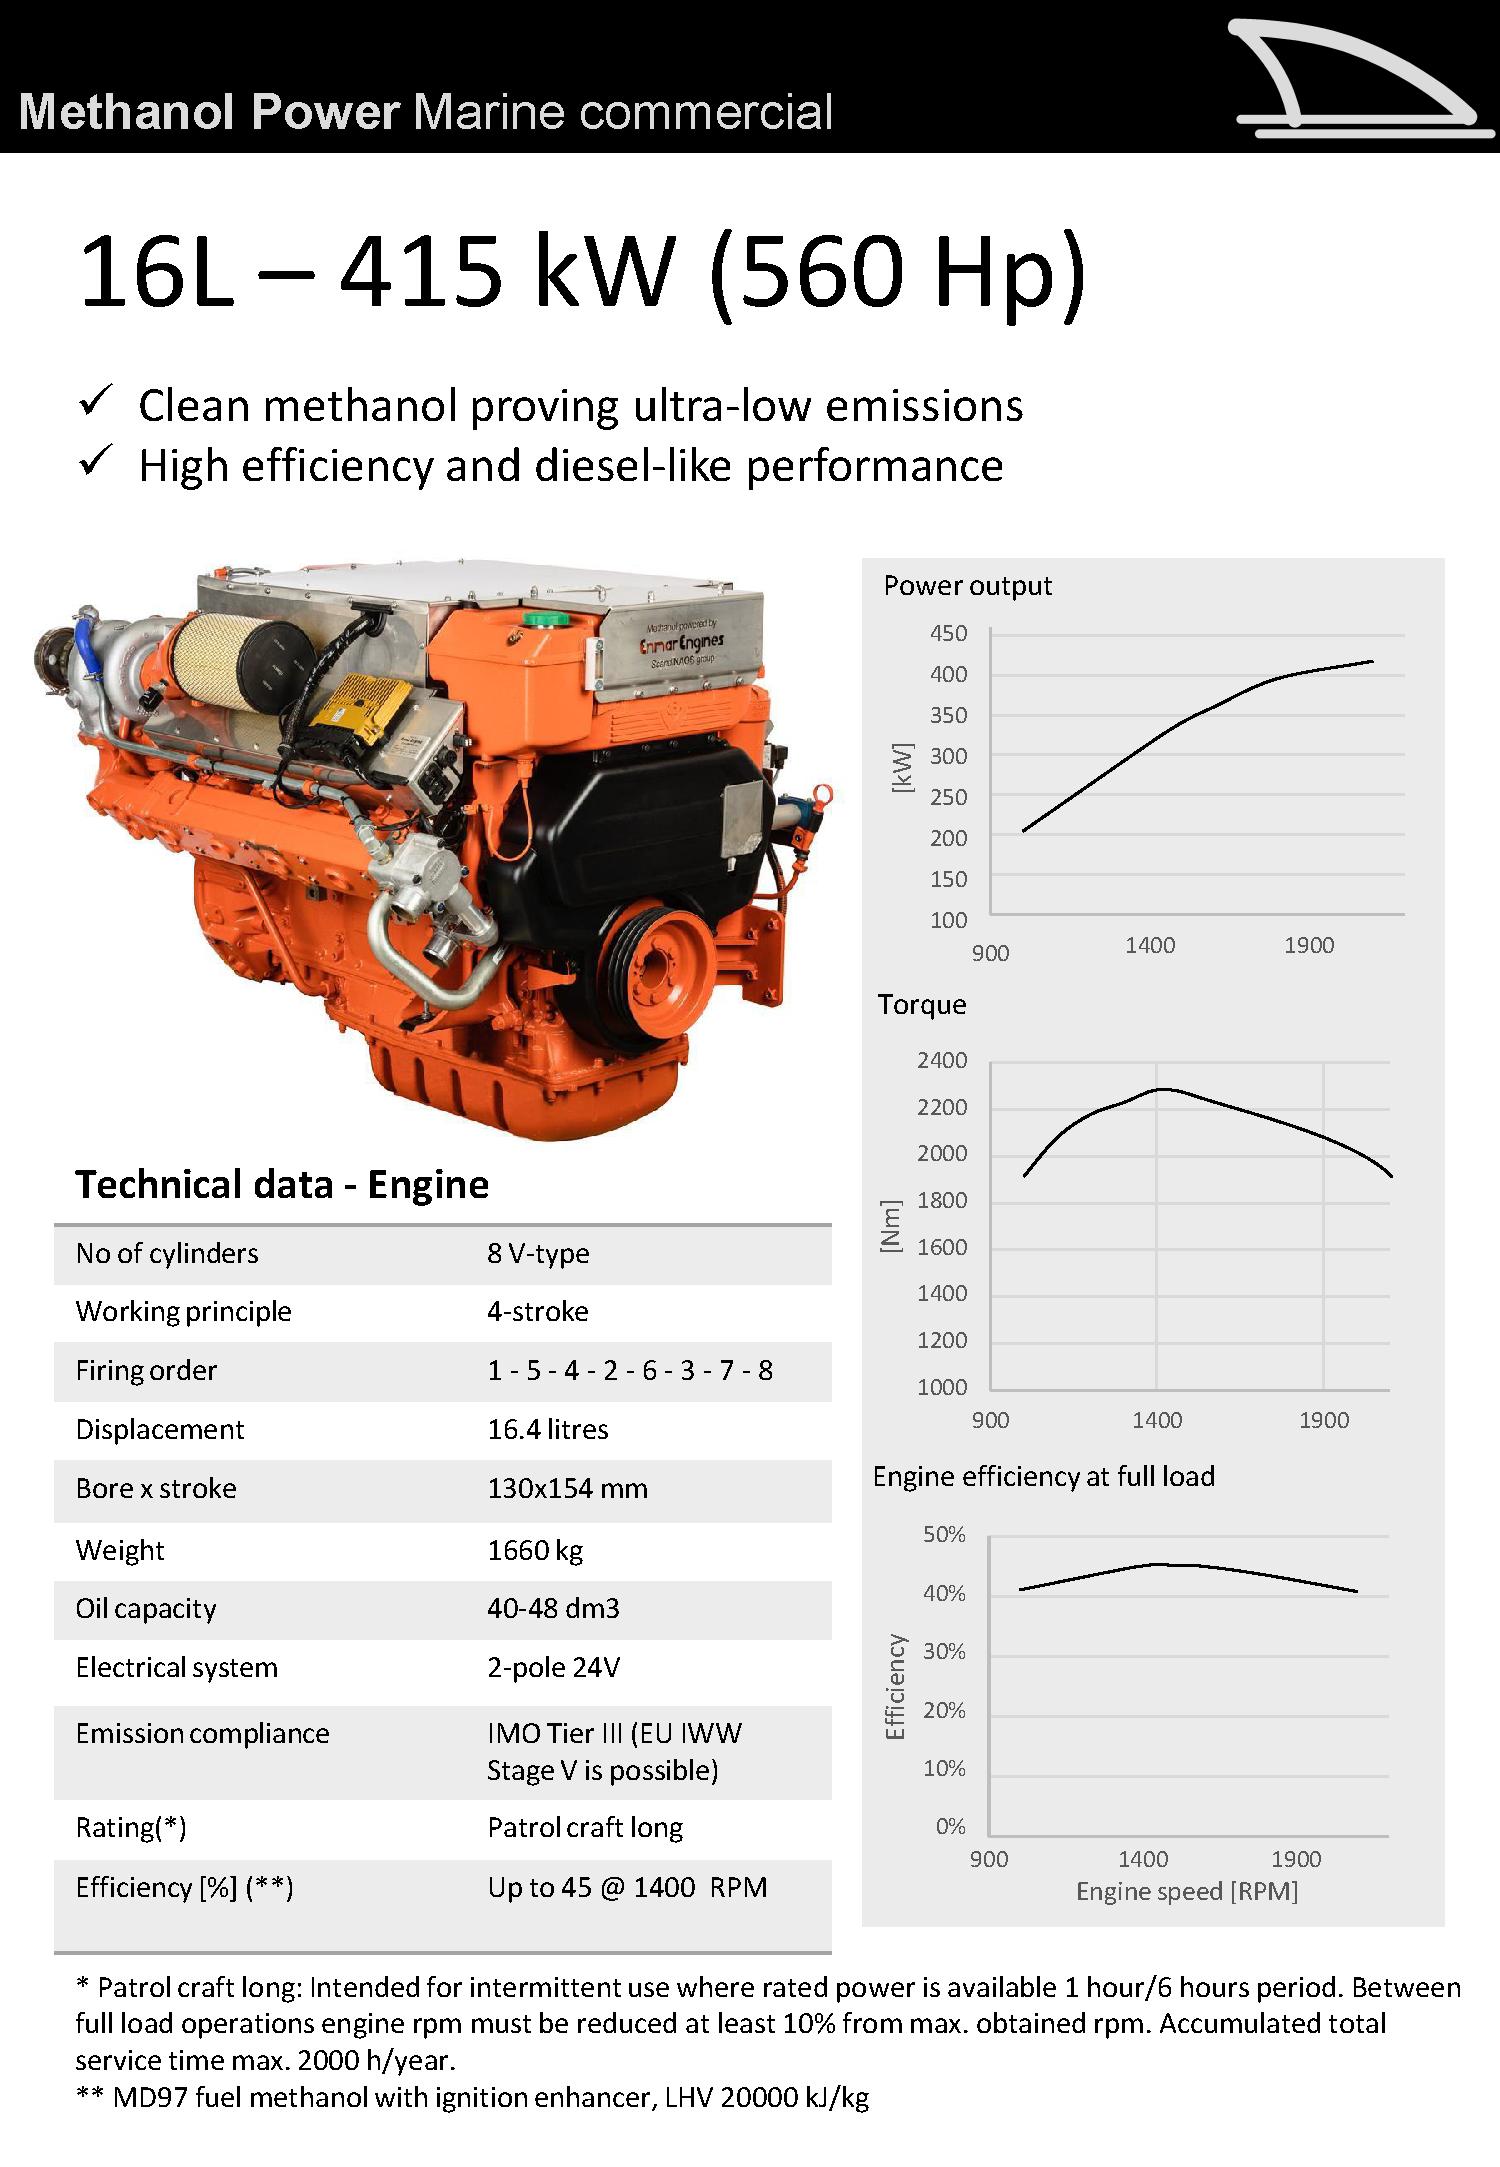 Metanol 16L - 415 kW (560 Hp)